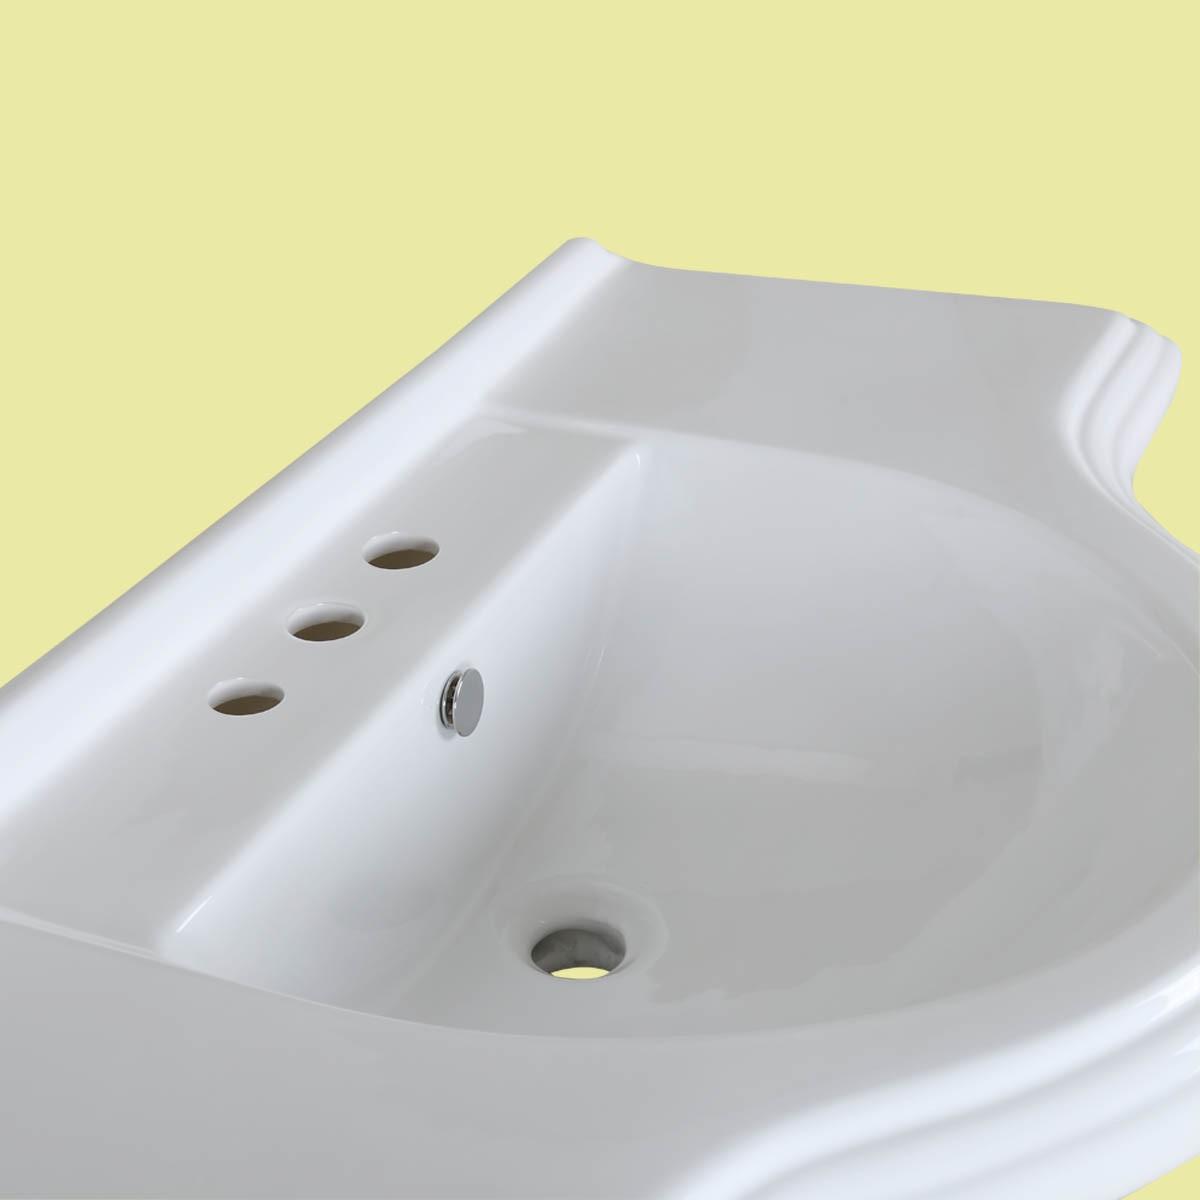 ... U003cPREu003eBathroom Pedestal Sink Vintage Design White China 8in Widespread  Faucet Holesu003c/ ...